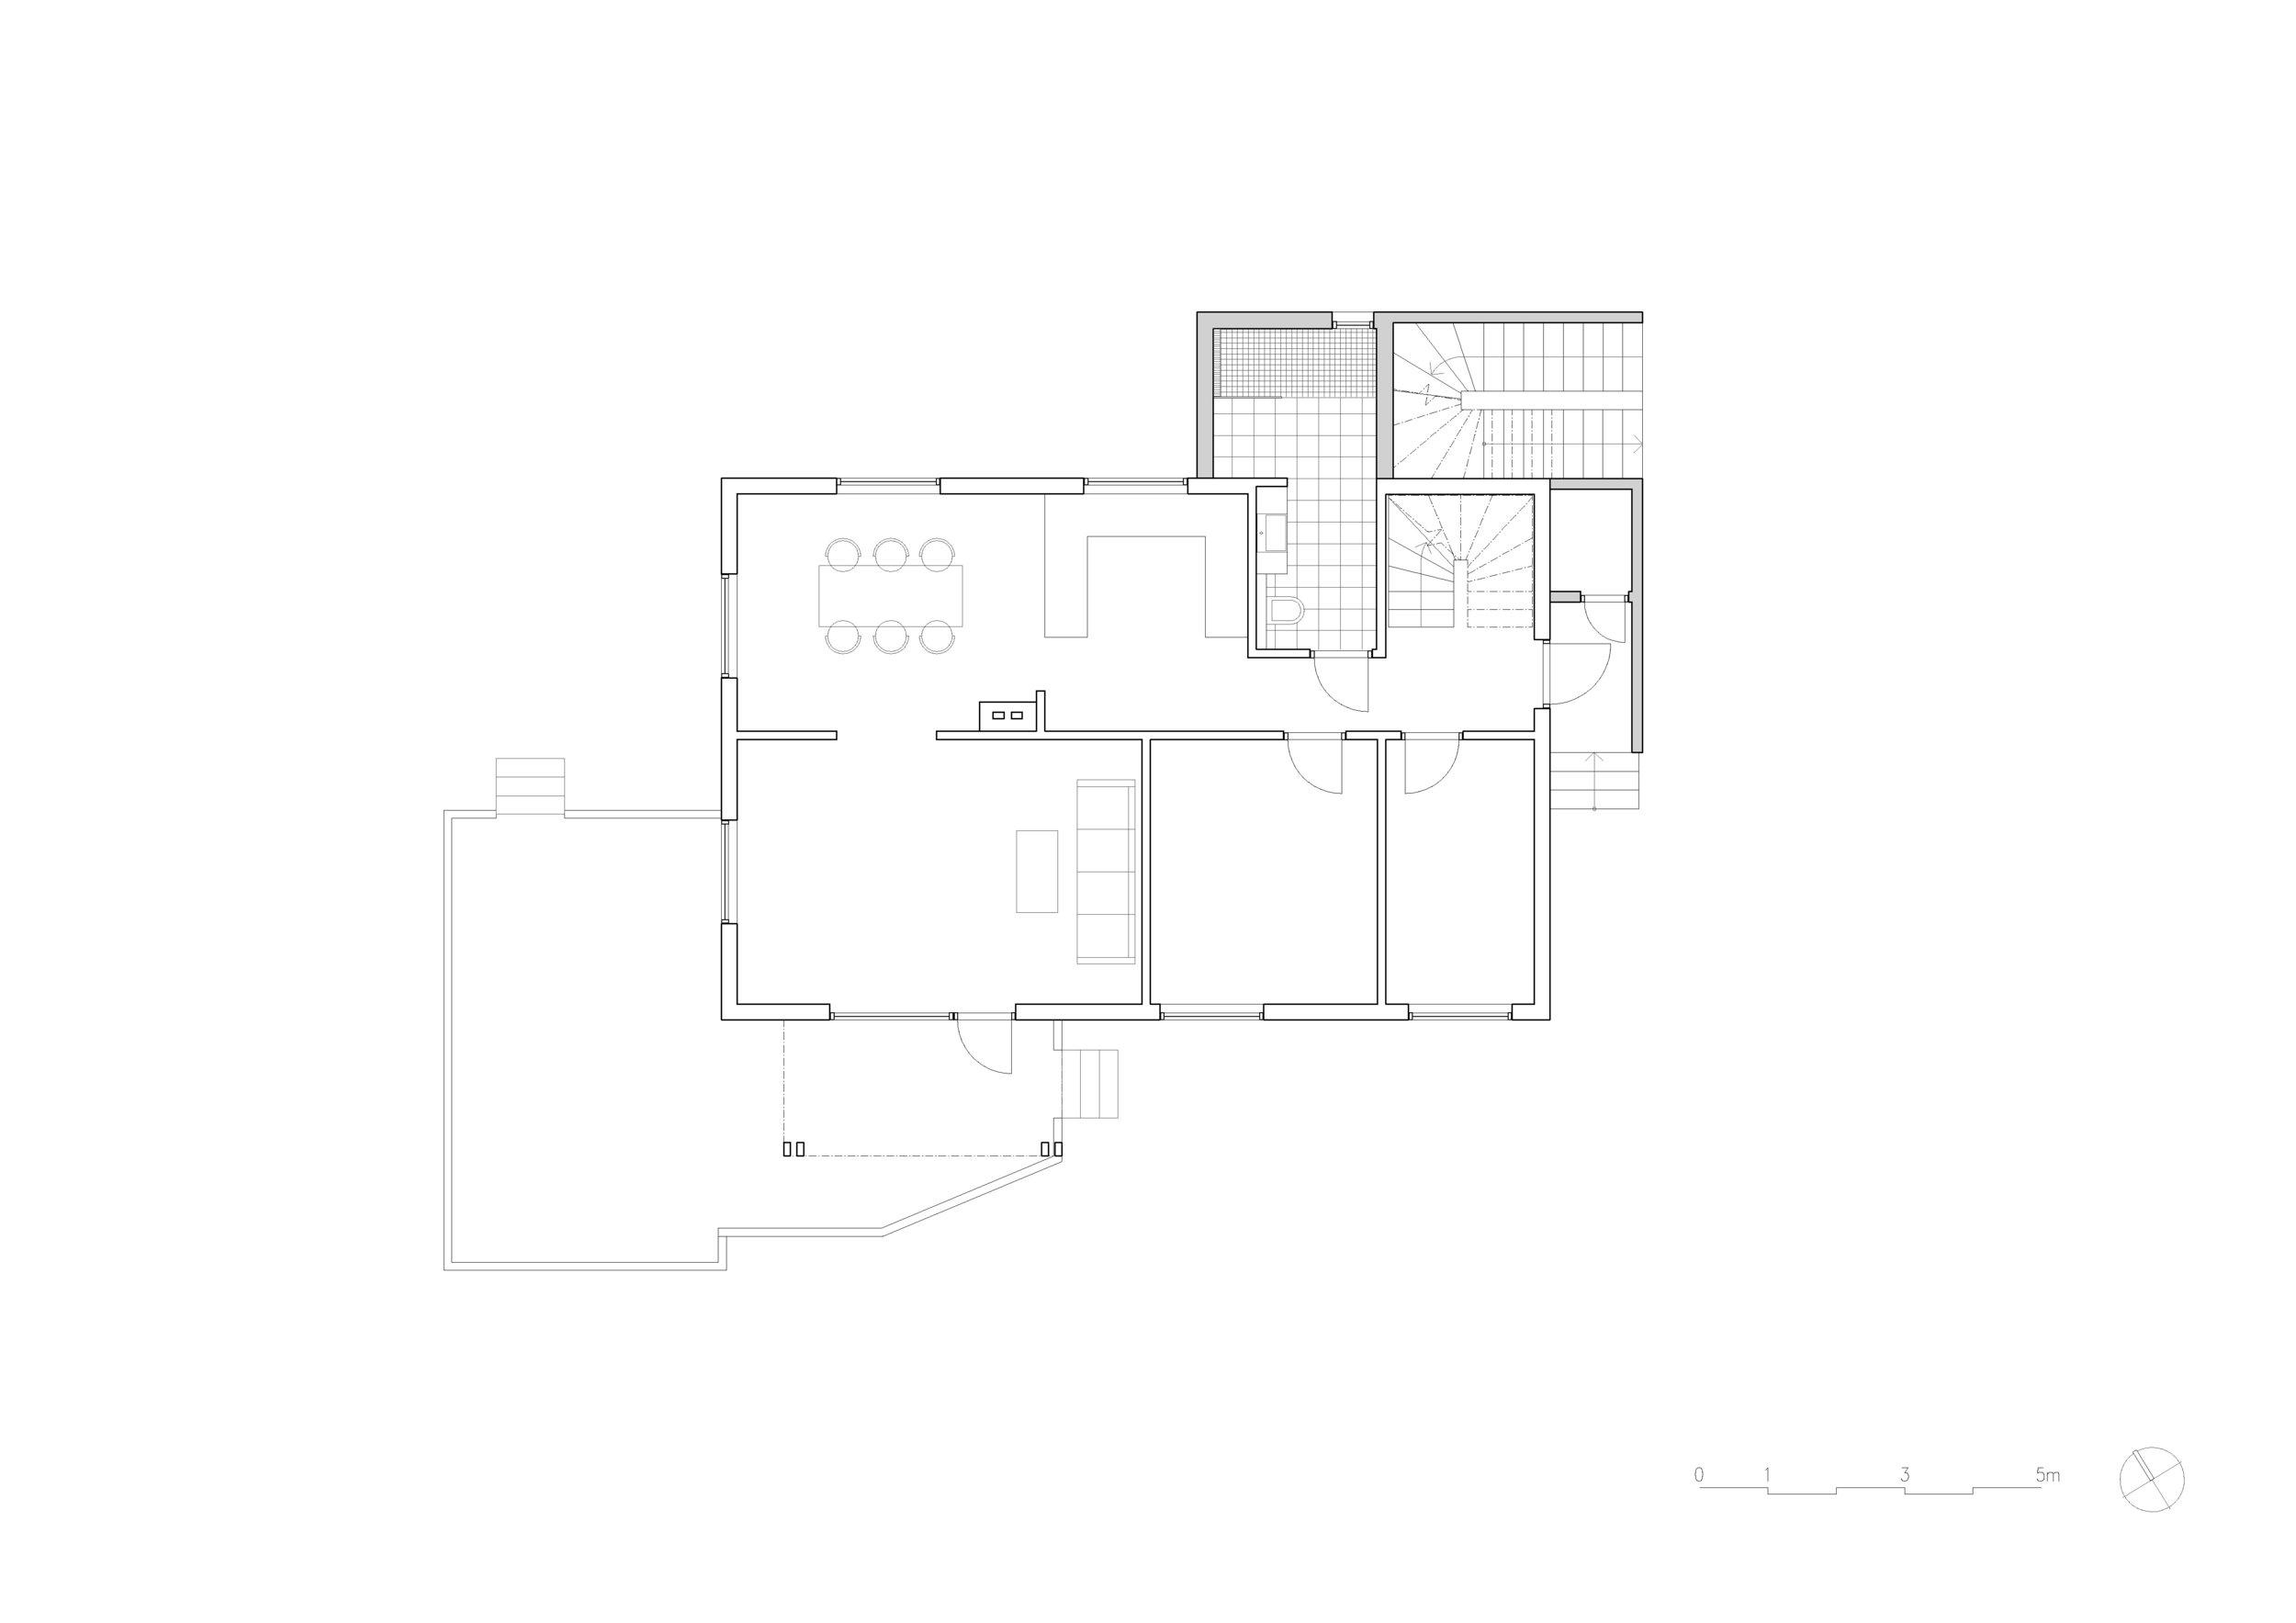 planm (1).jpg